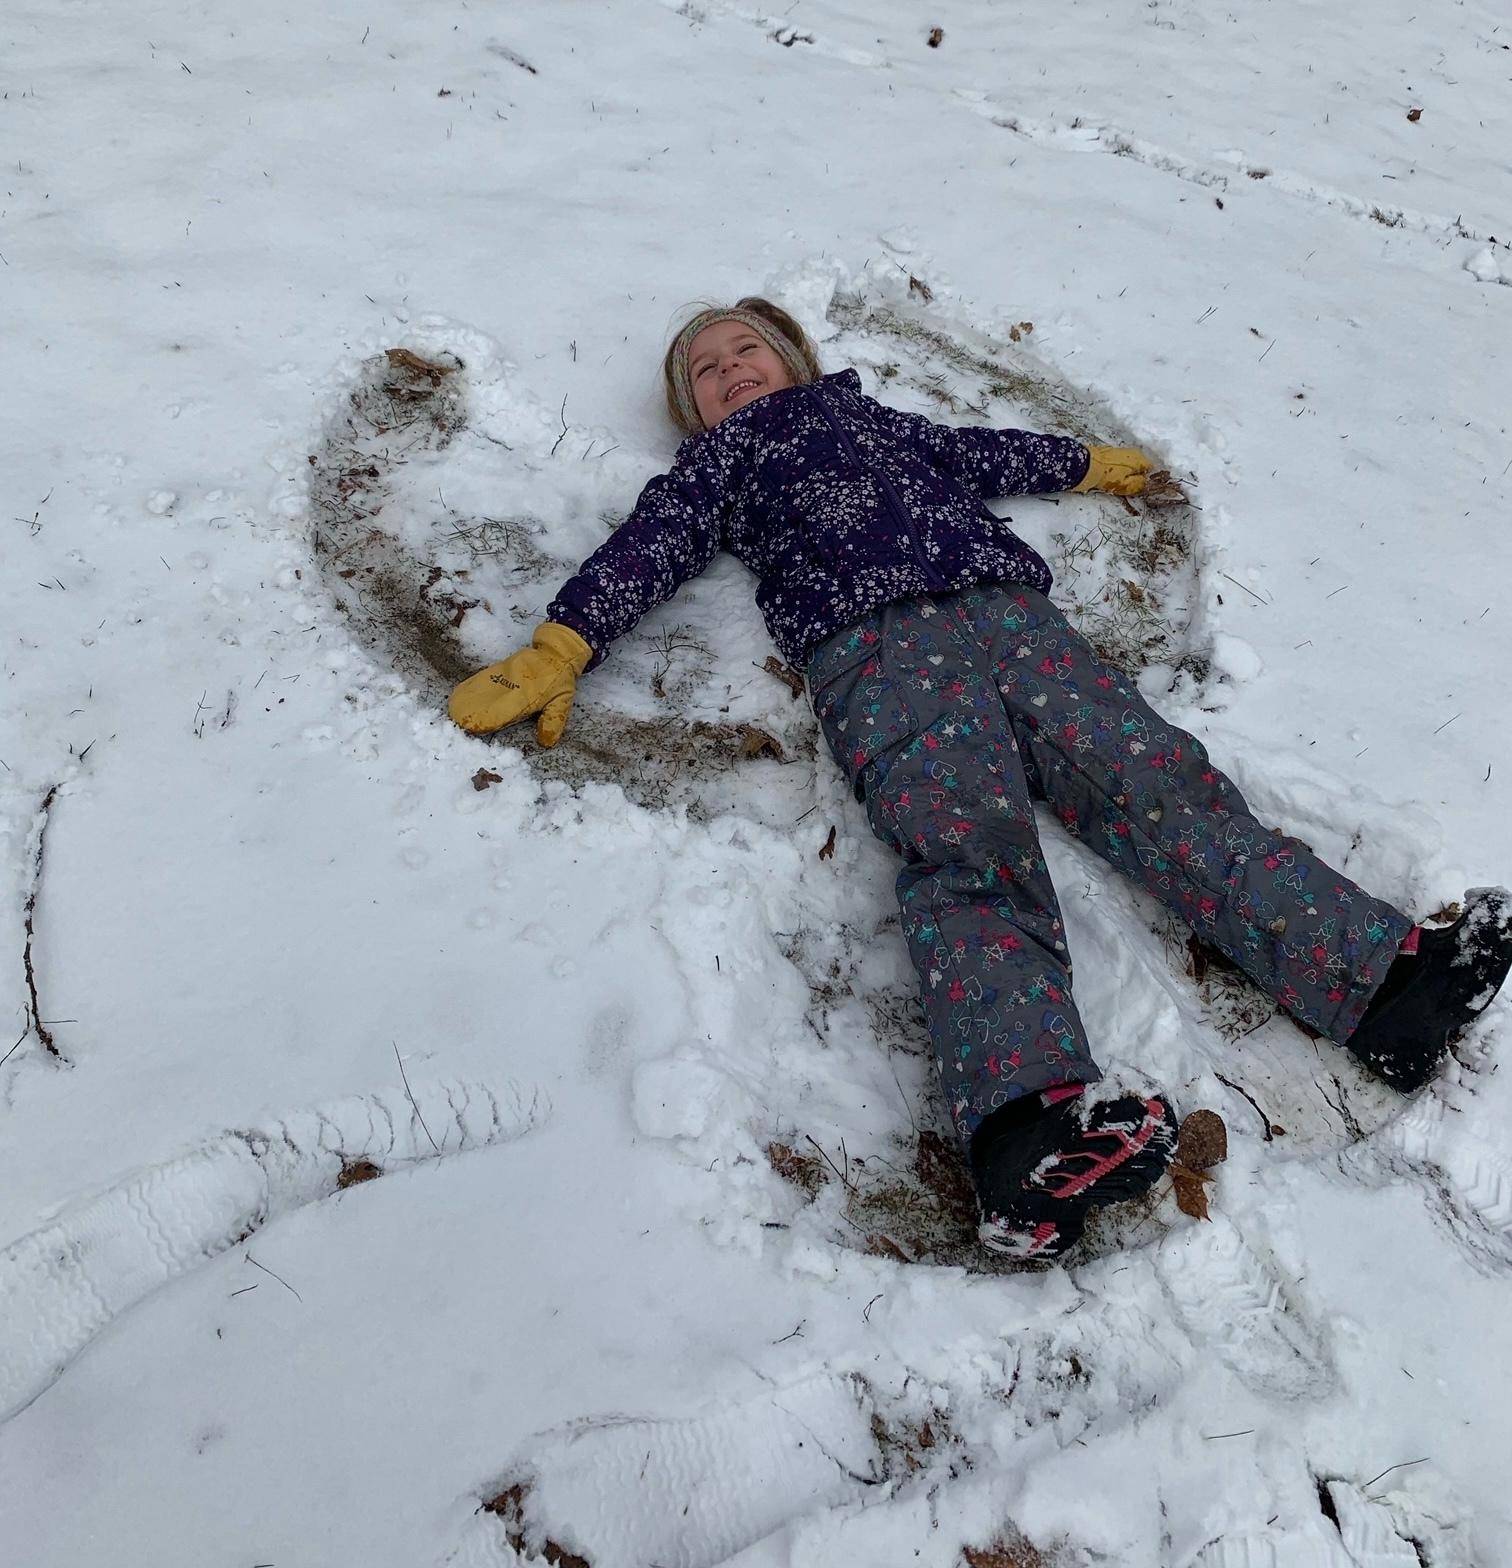 PreK Laugh Learn 8 Week 3 Winter Games 2021 Moment of the Week